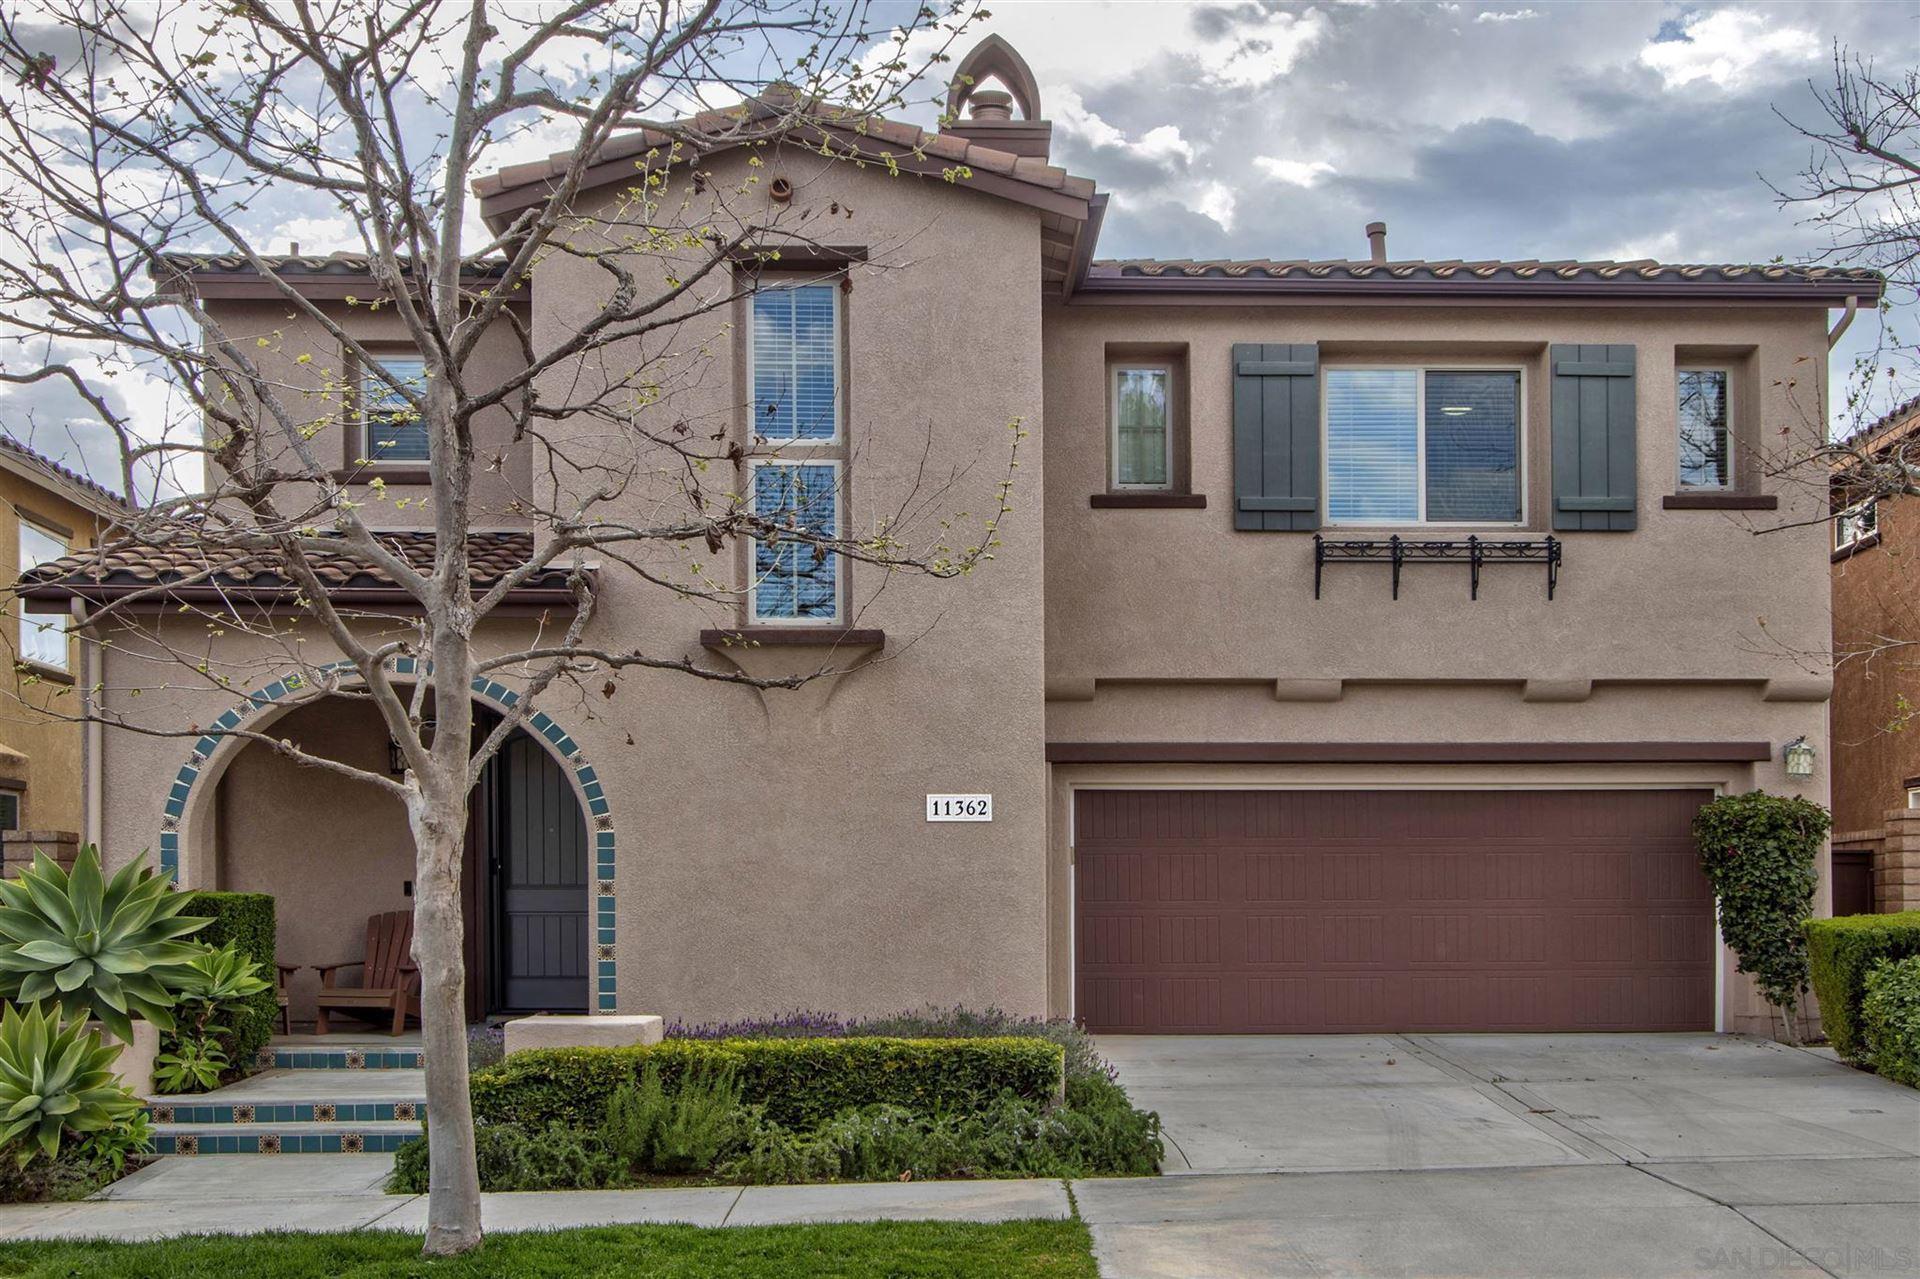 Photo of 11362 Nahama Lane, San Diego, CA 92130 (MLS # 210009613)